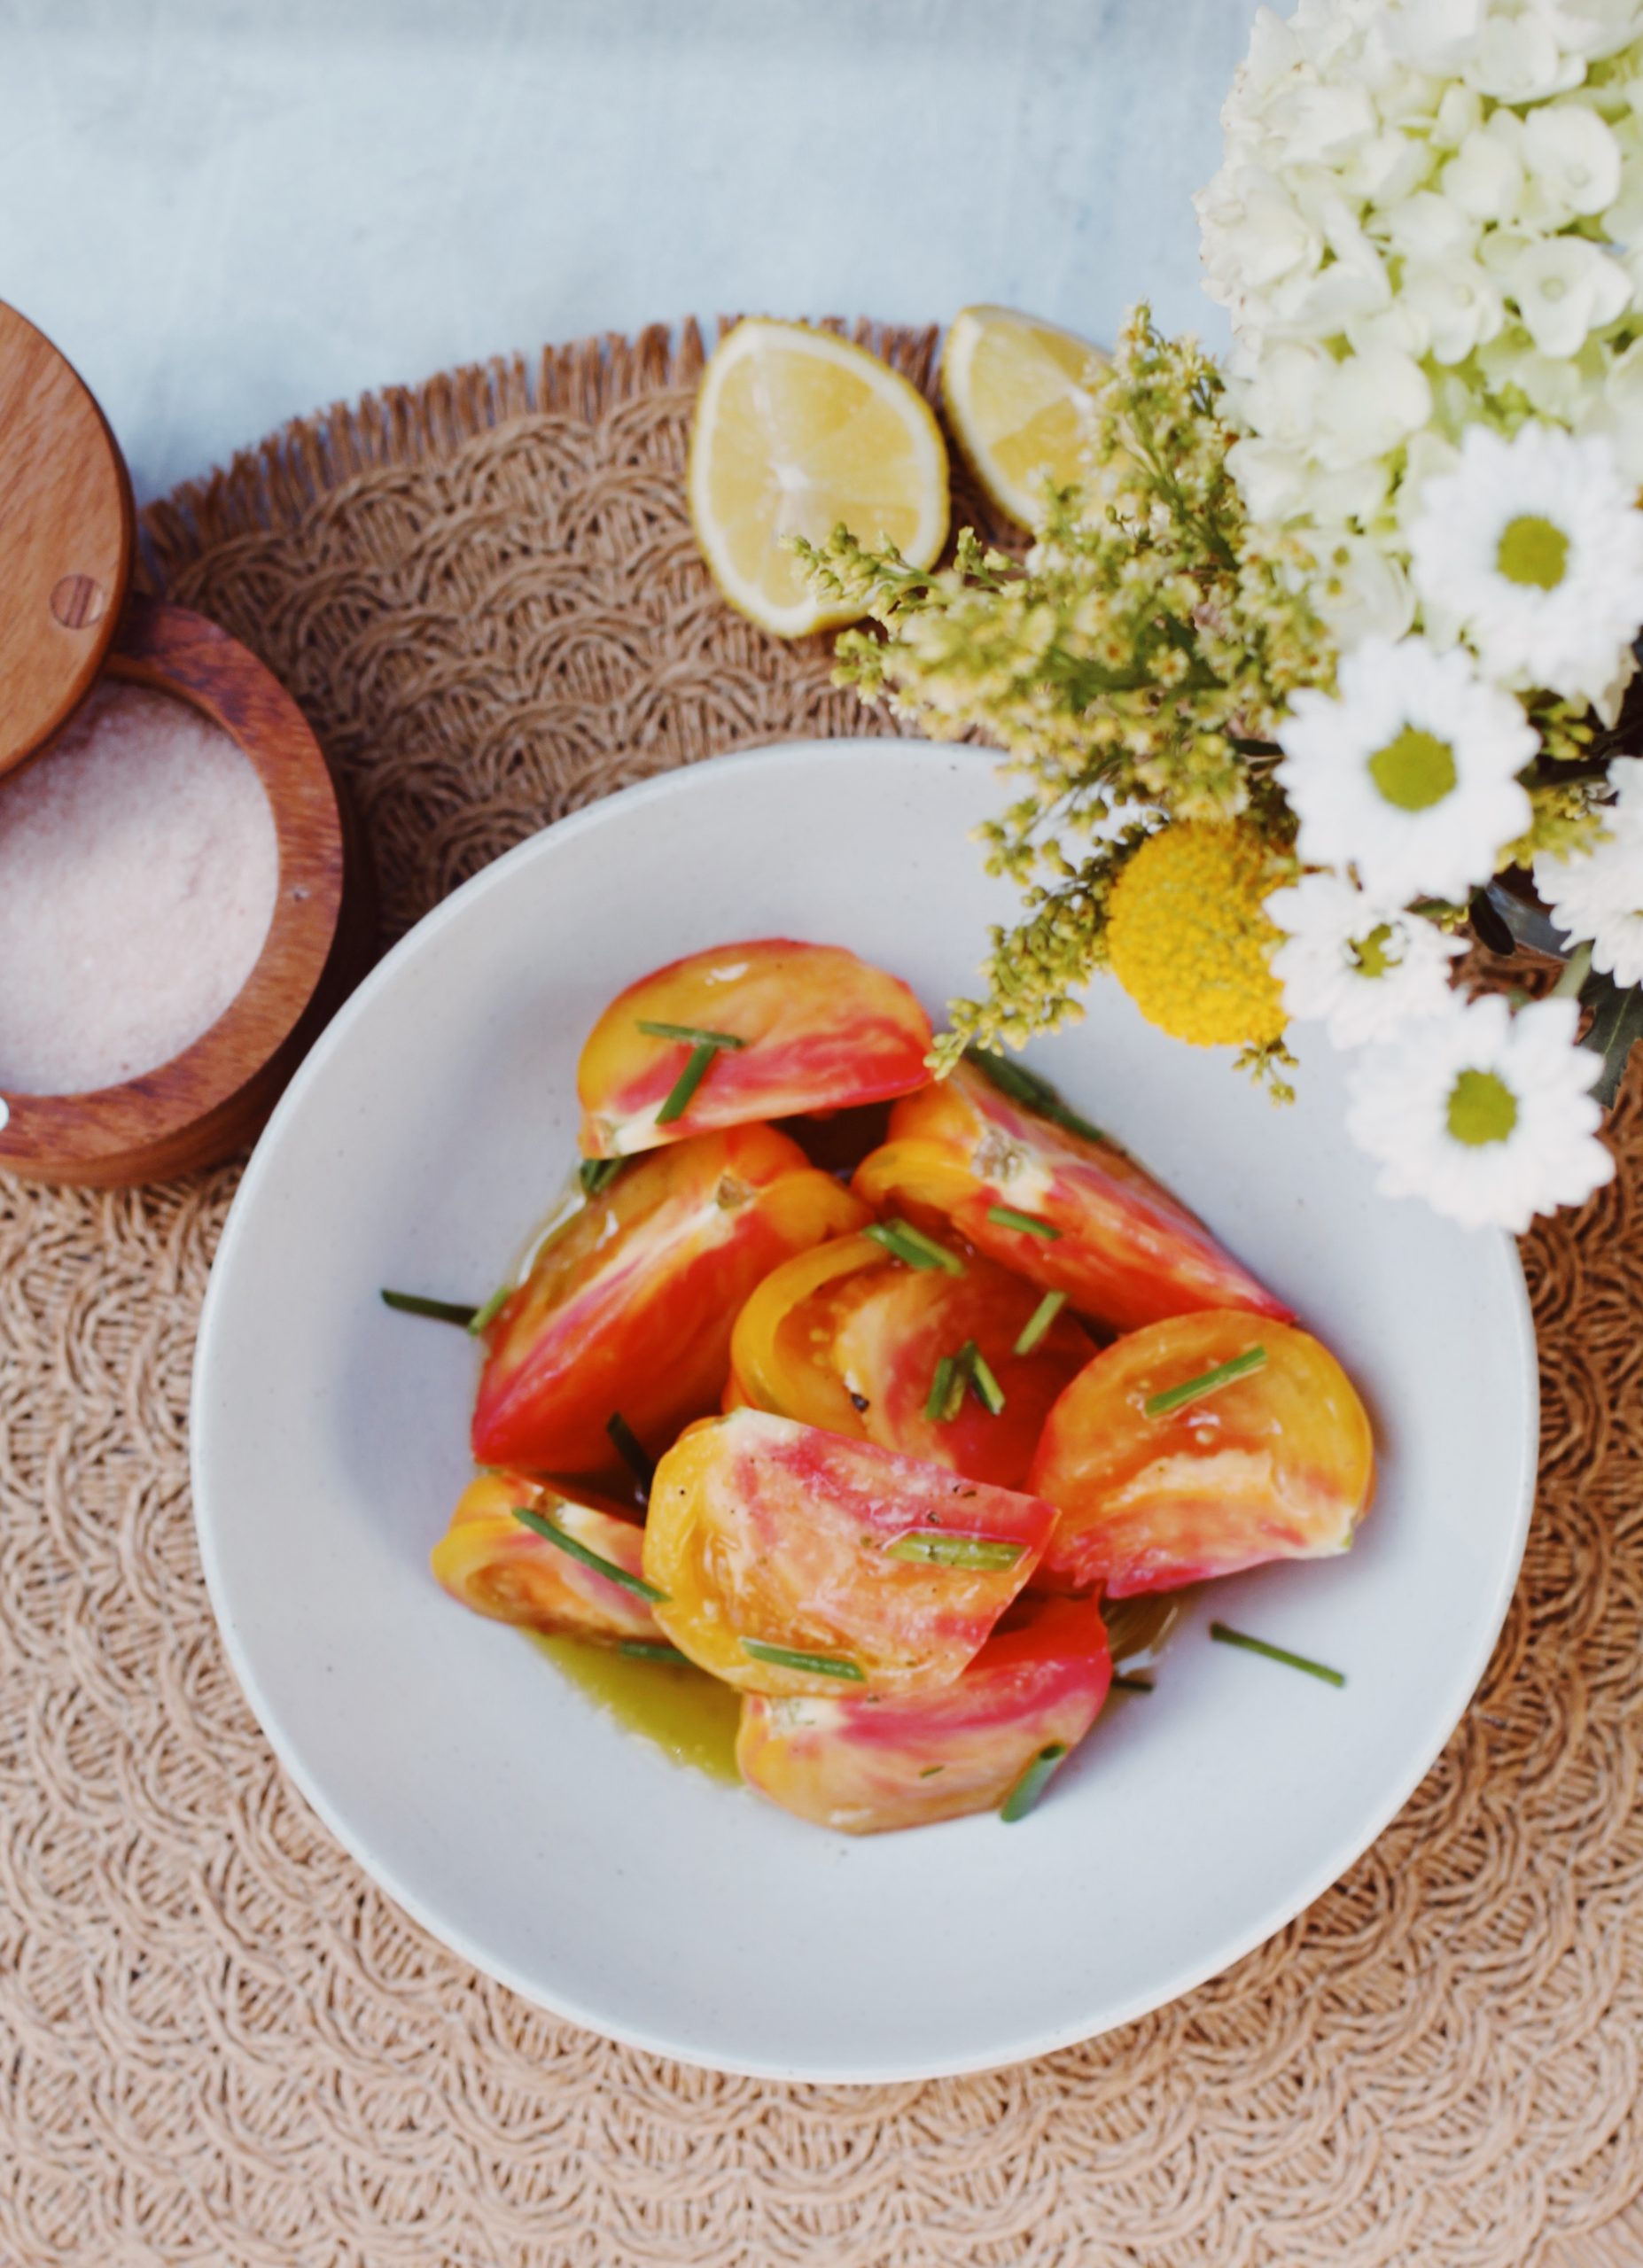 Recipe: Heirloom Tomato Salad with Honey Mustard Vinaigrette